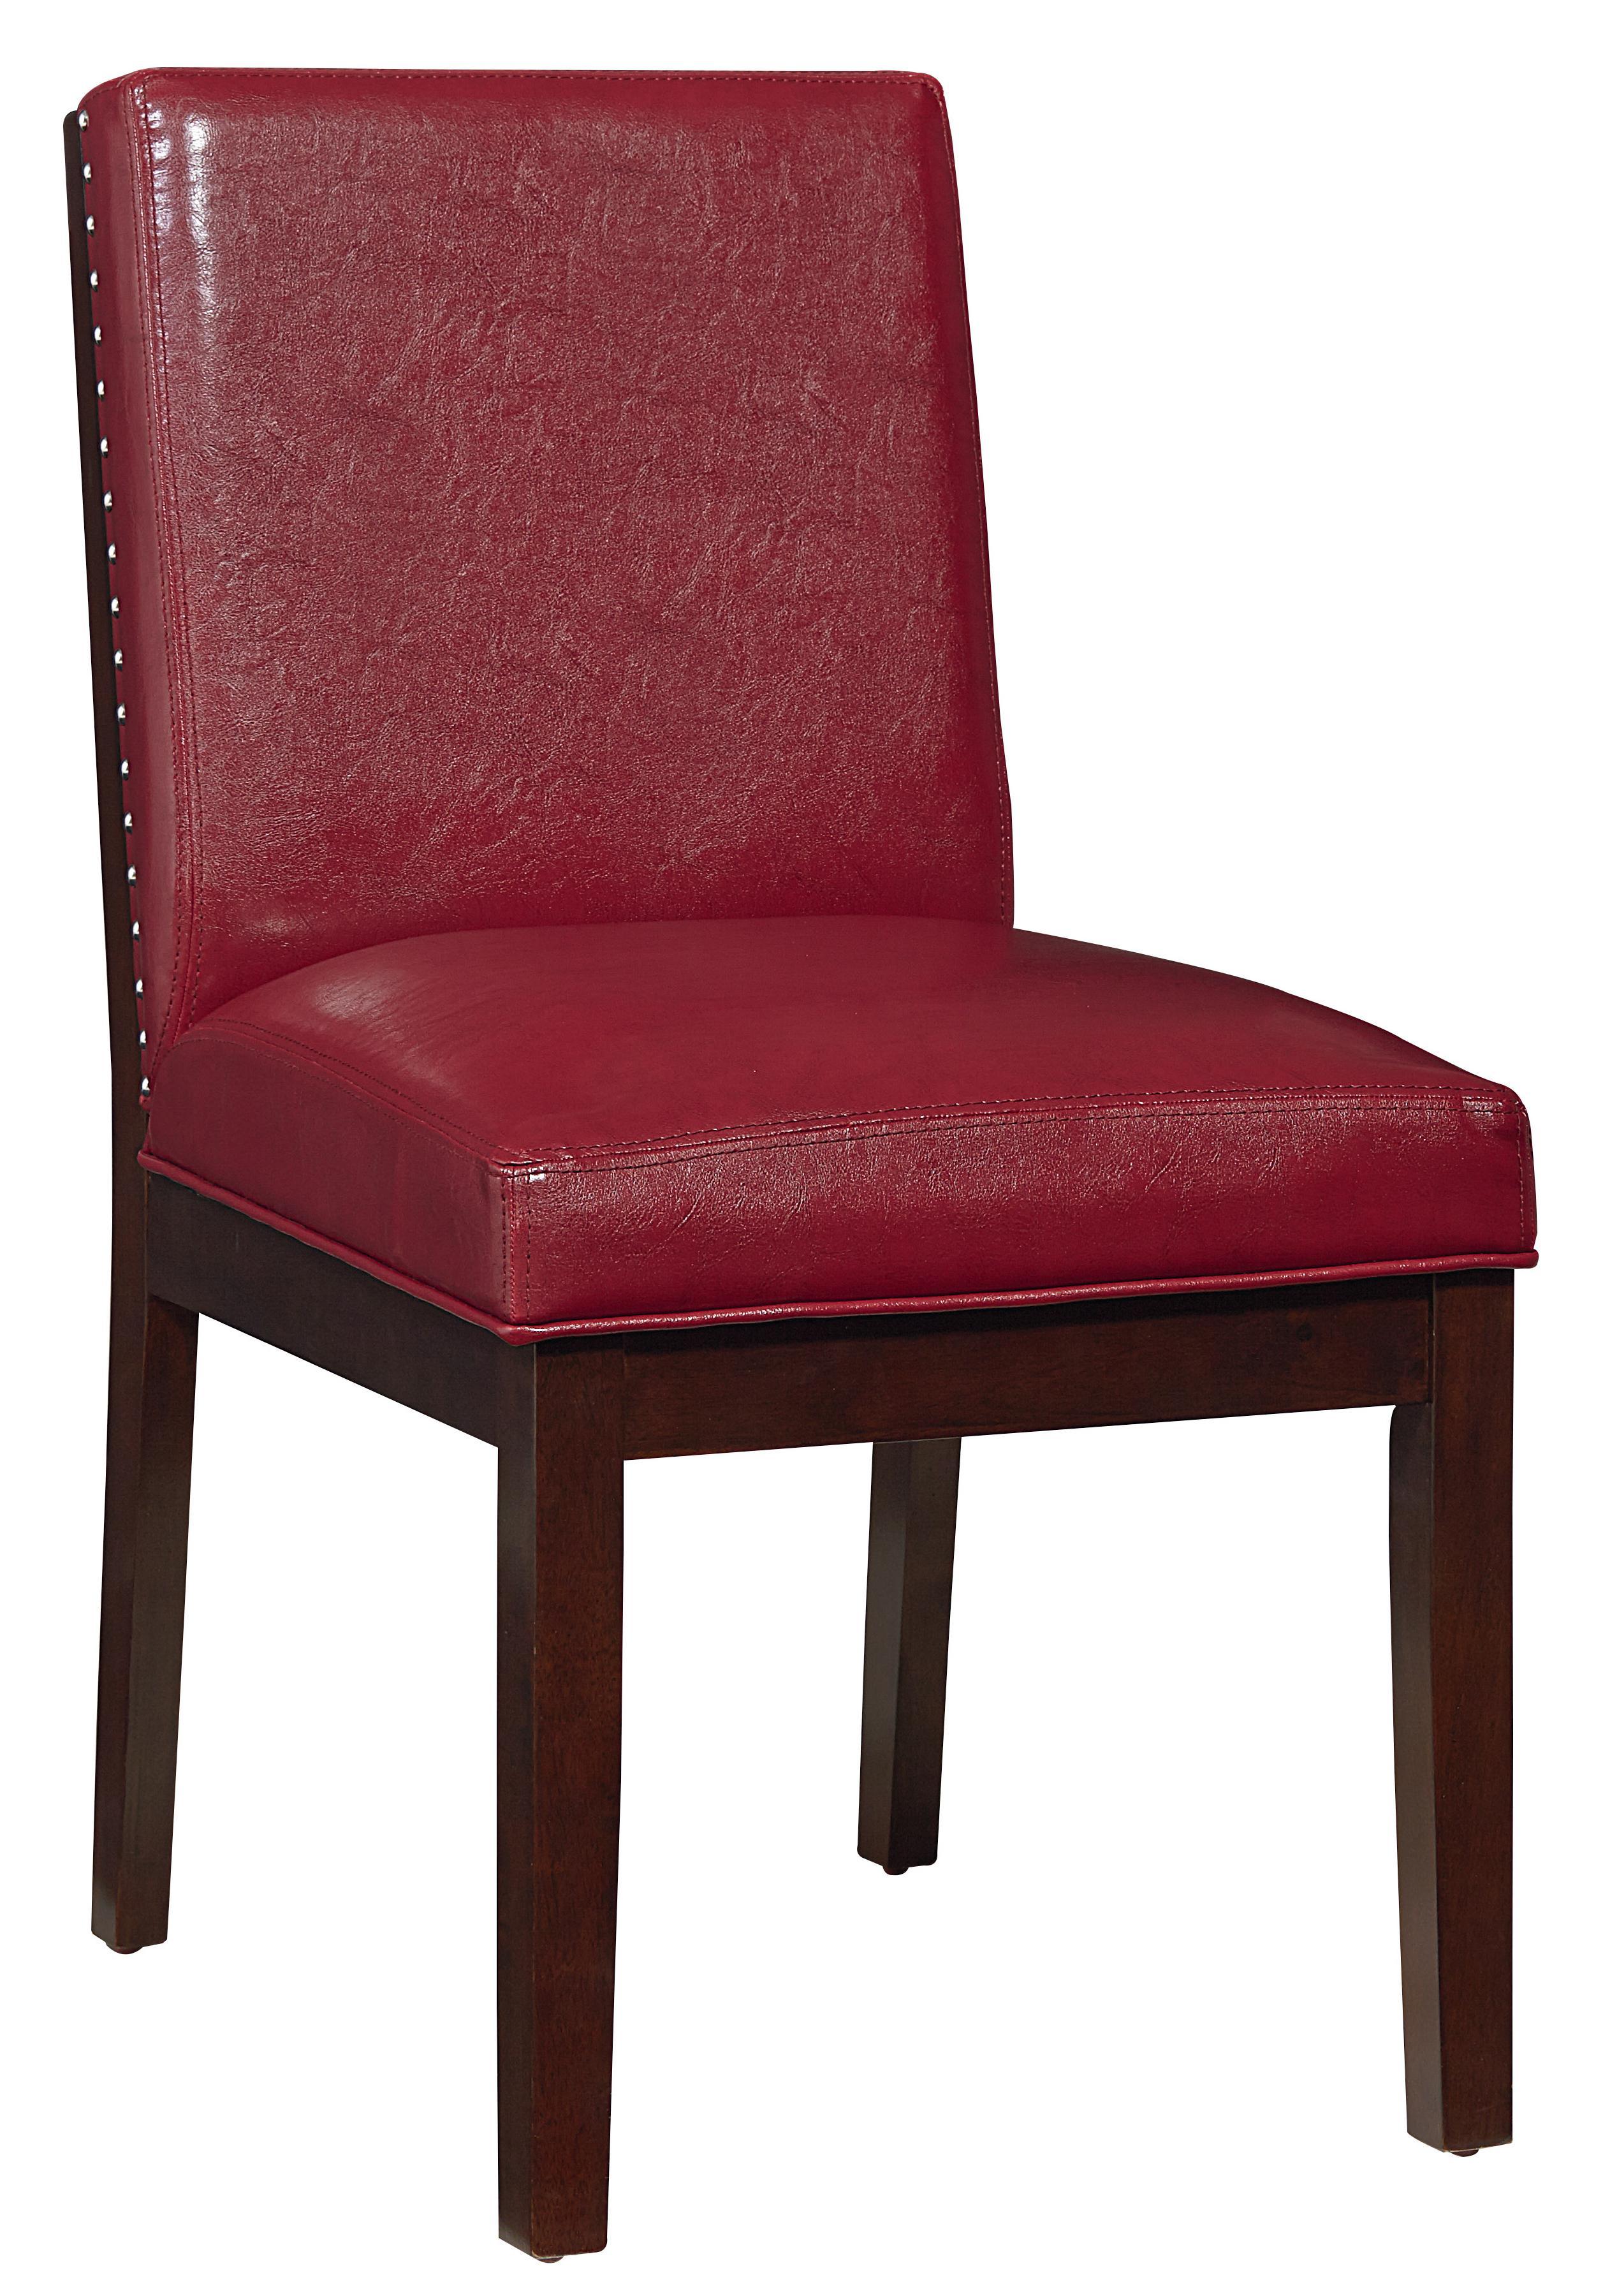 Standard Furniture Couture Elegance Upholstered Side Chair - Item Number: 10569